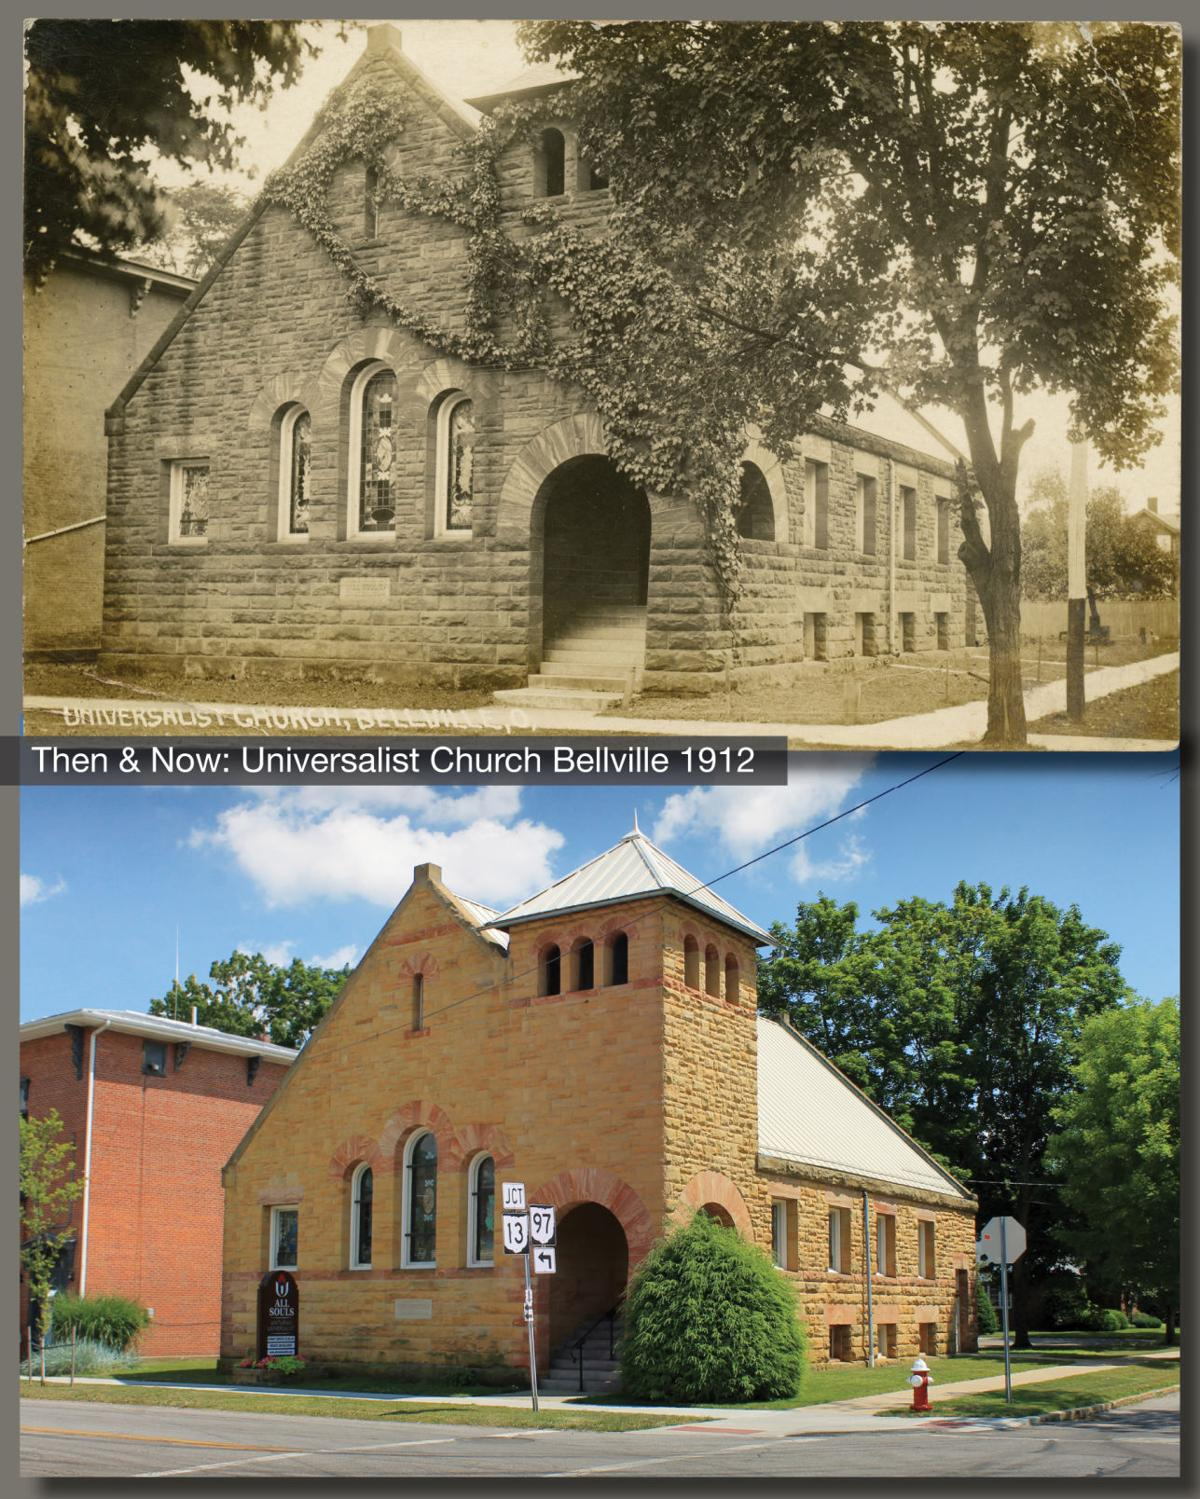 Then & Now: Universalist Church Bellville 1912